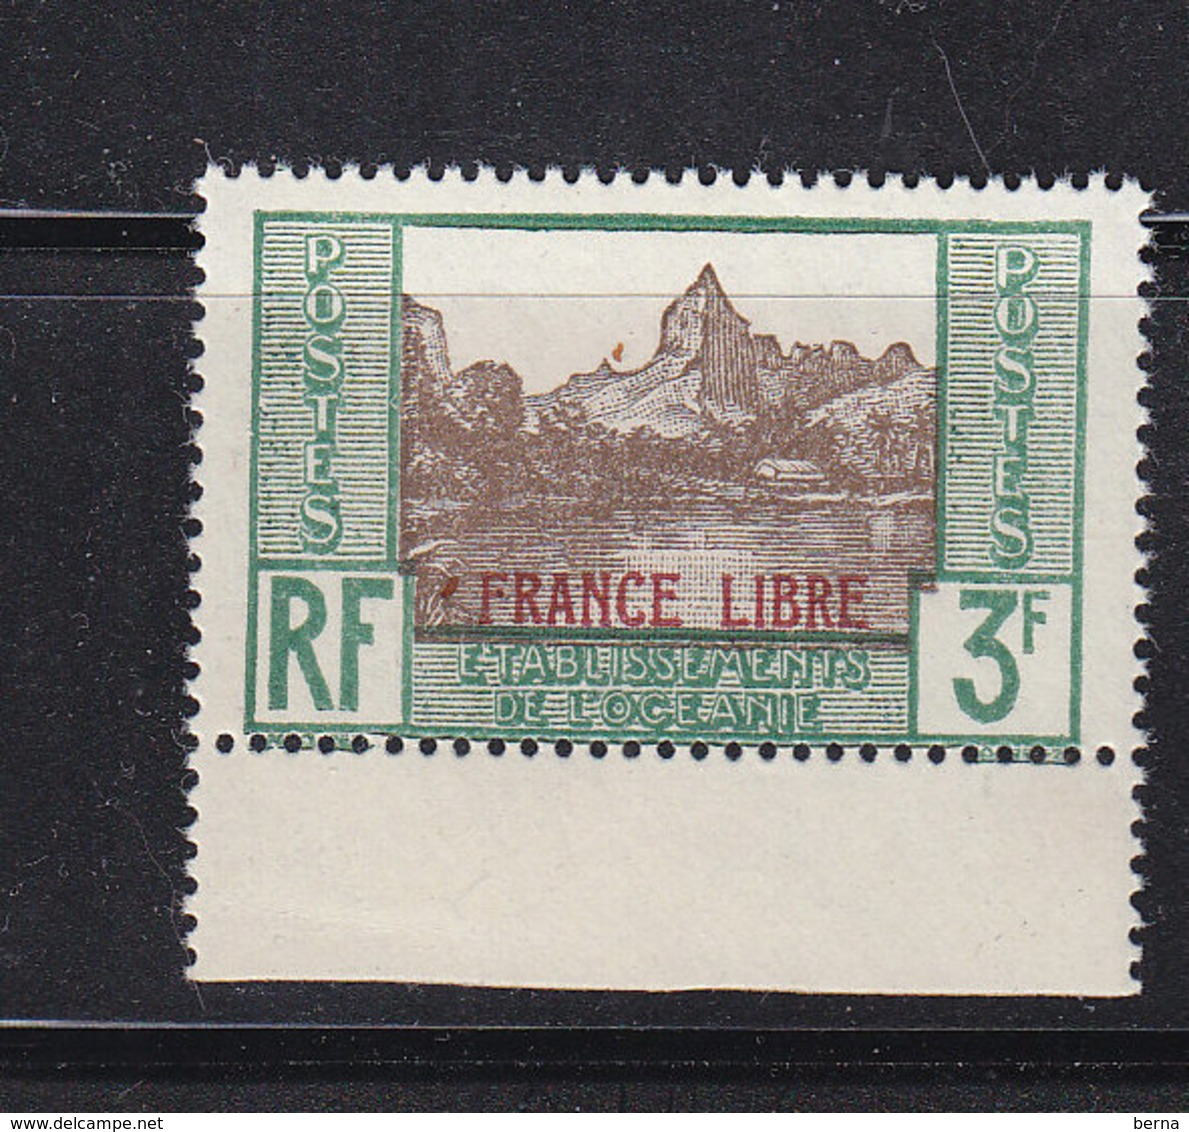 OCEANIE 140 FRANCE LIBRE LUXE NEUF SANS CHARNIERE - Oceania (1892-1958)